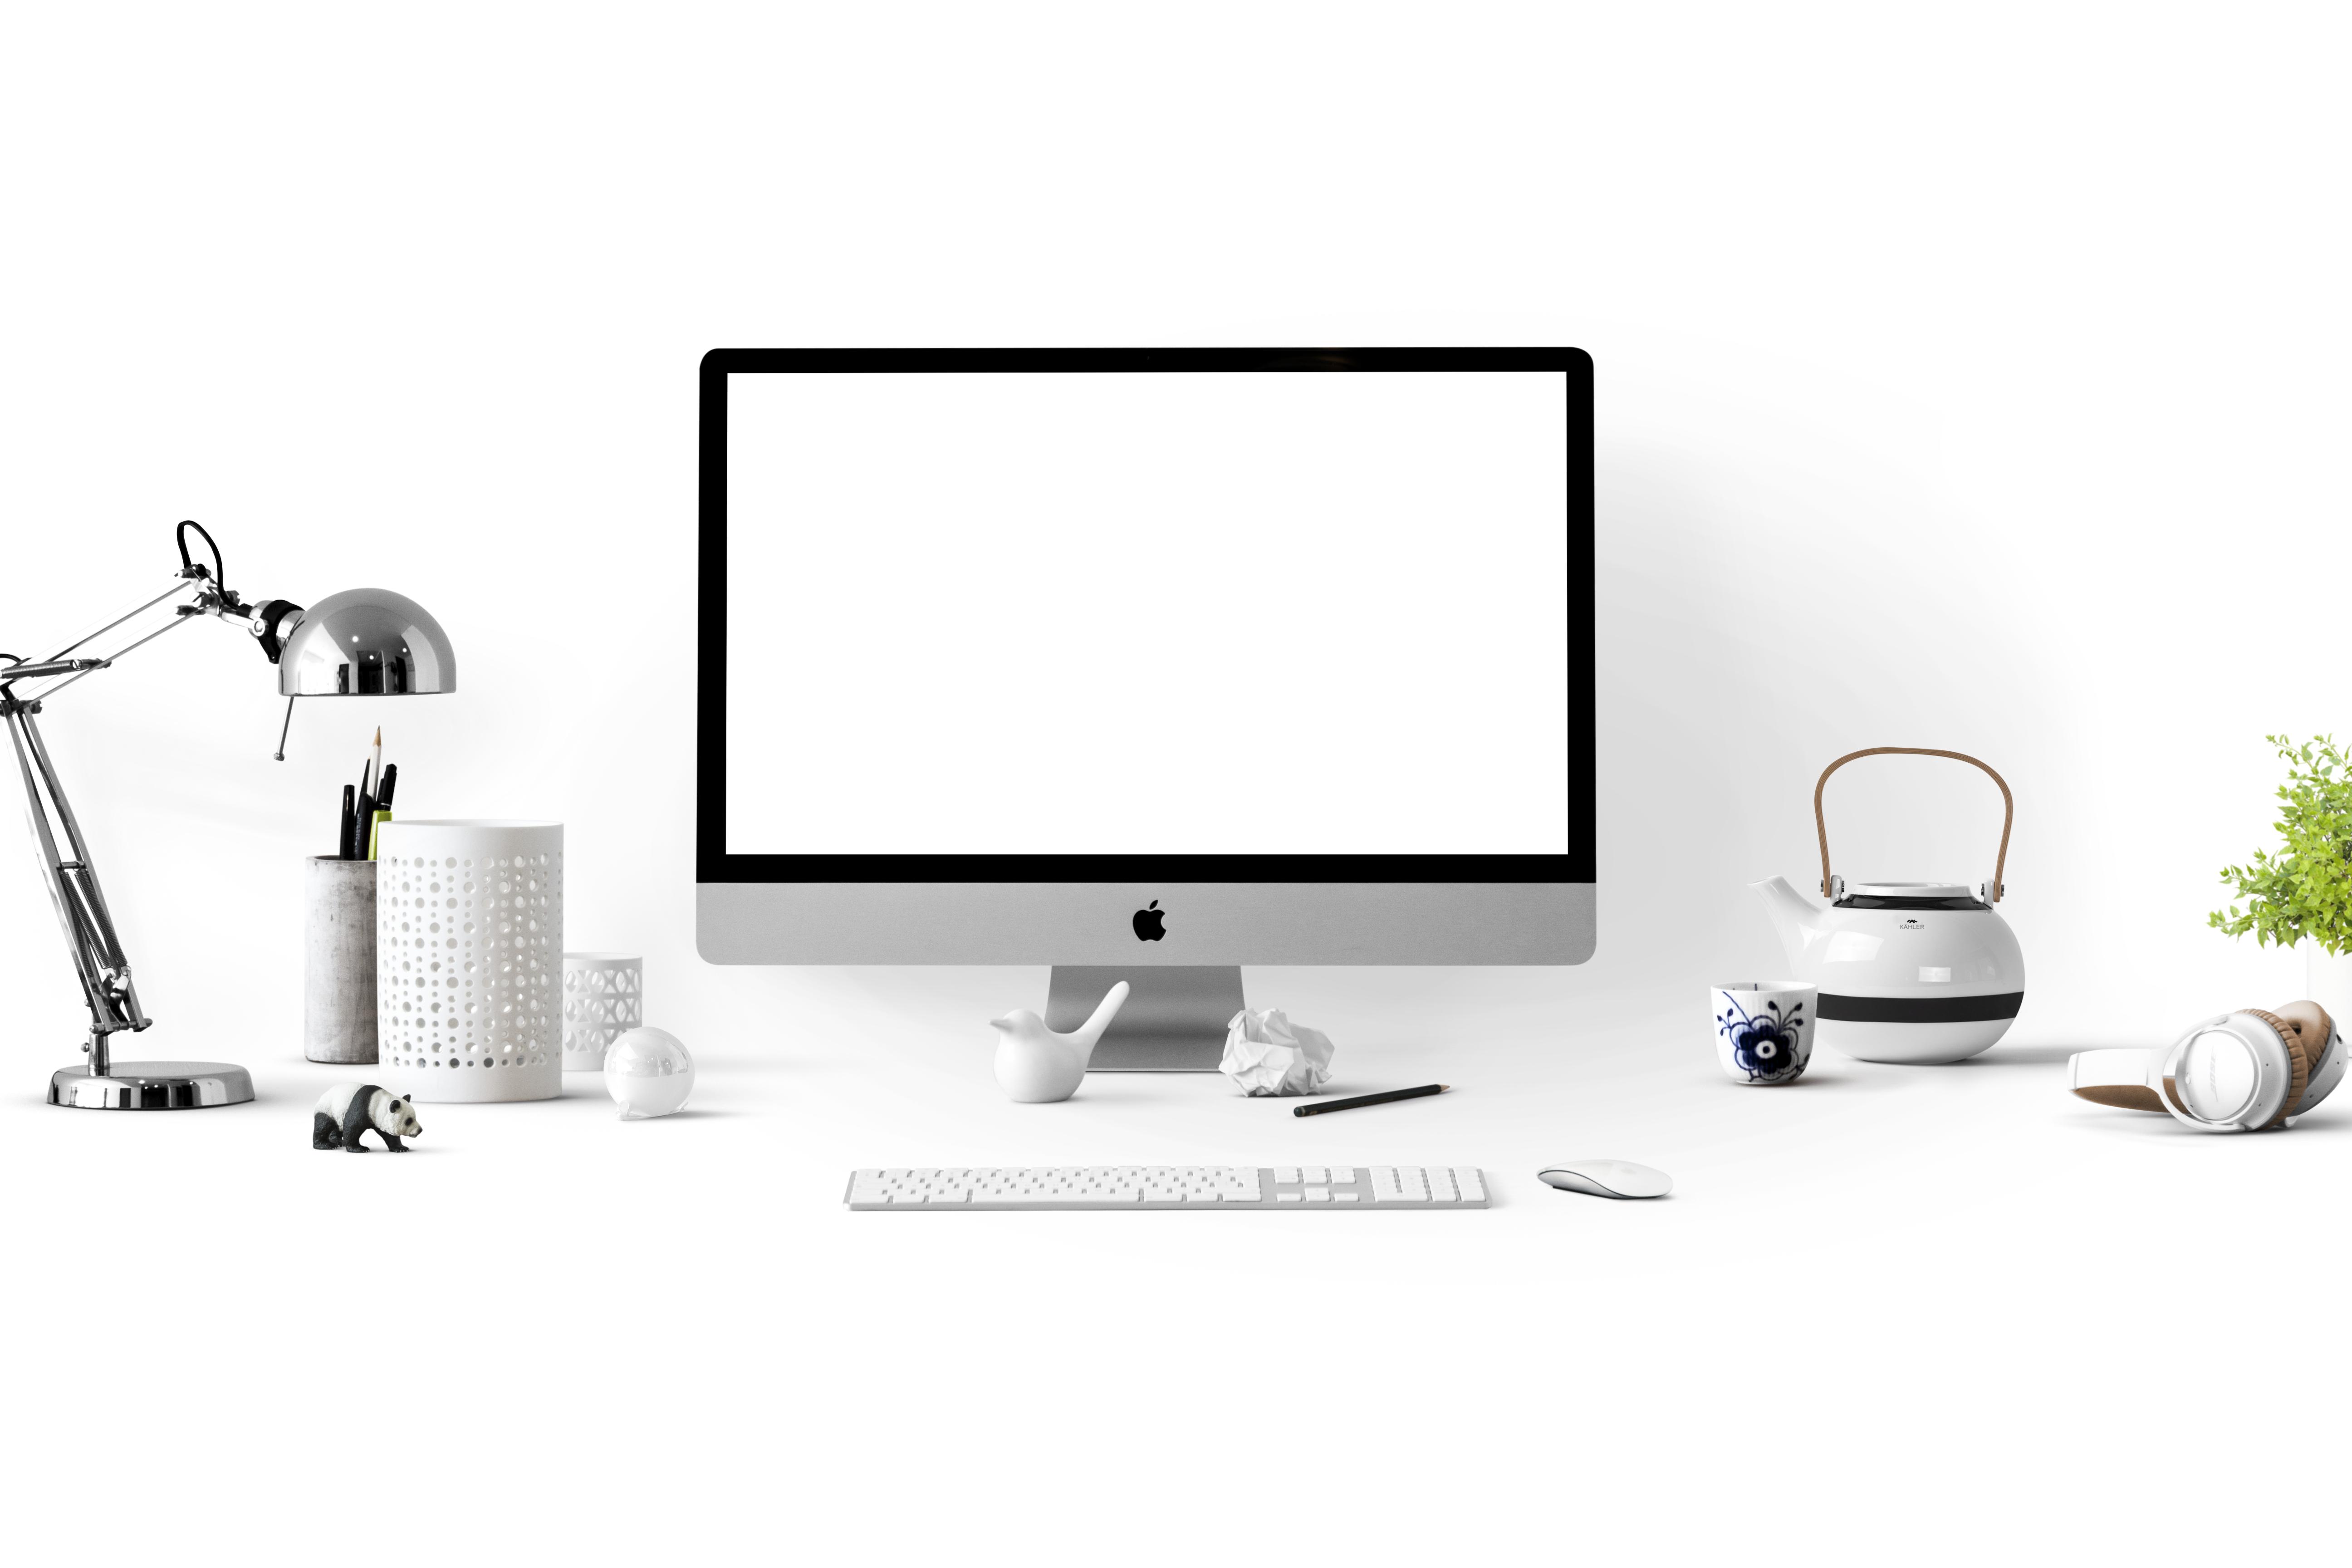 Silver Imac Near White Ceramic Kettle, Apple, Technology, Teapot, Screen, HQ Photo